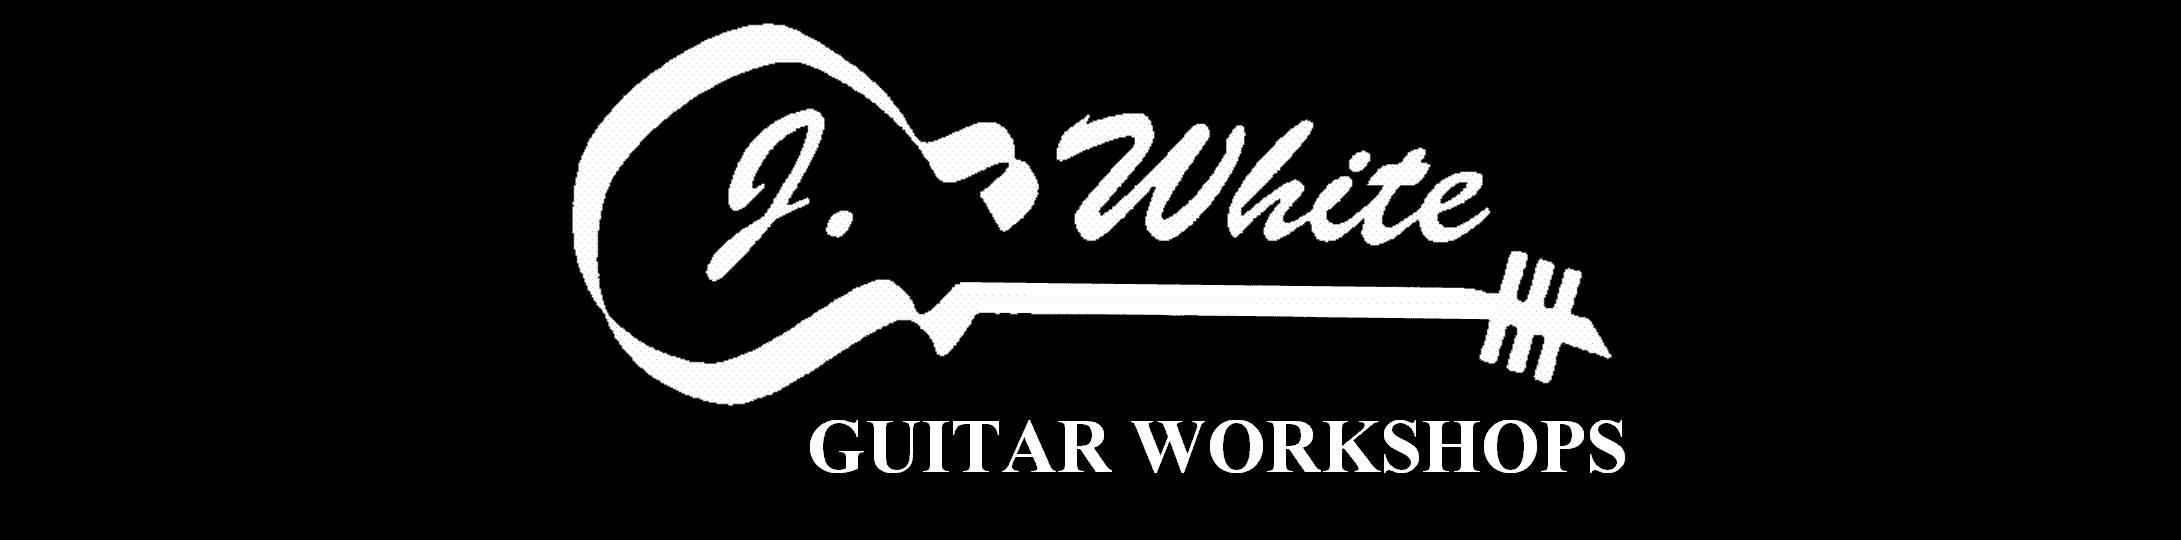 www.jwhite-guitarworkshops.co.uk